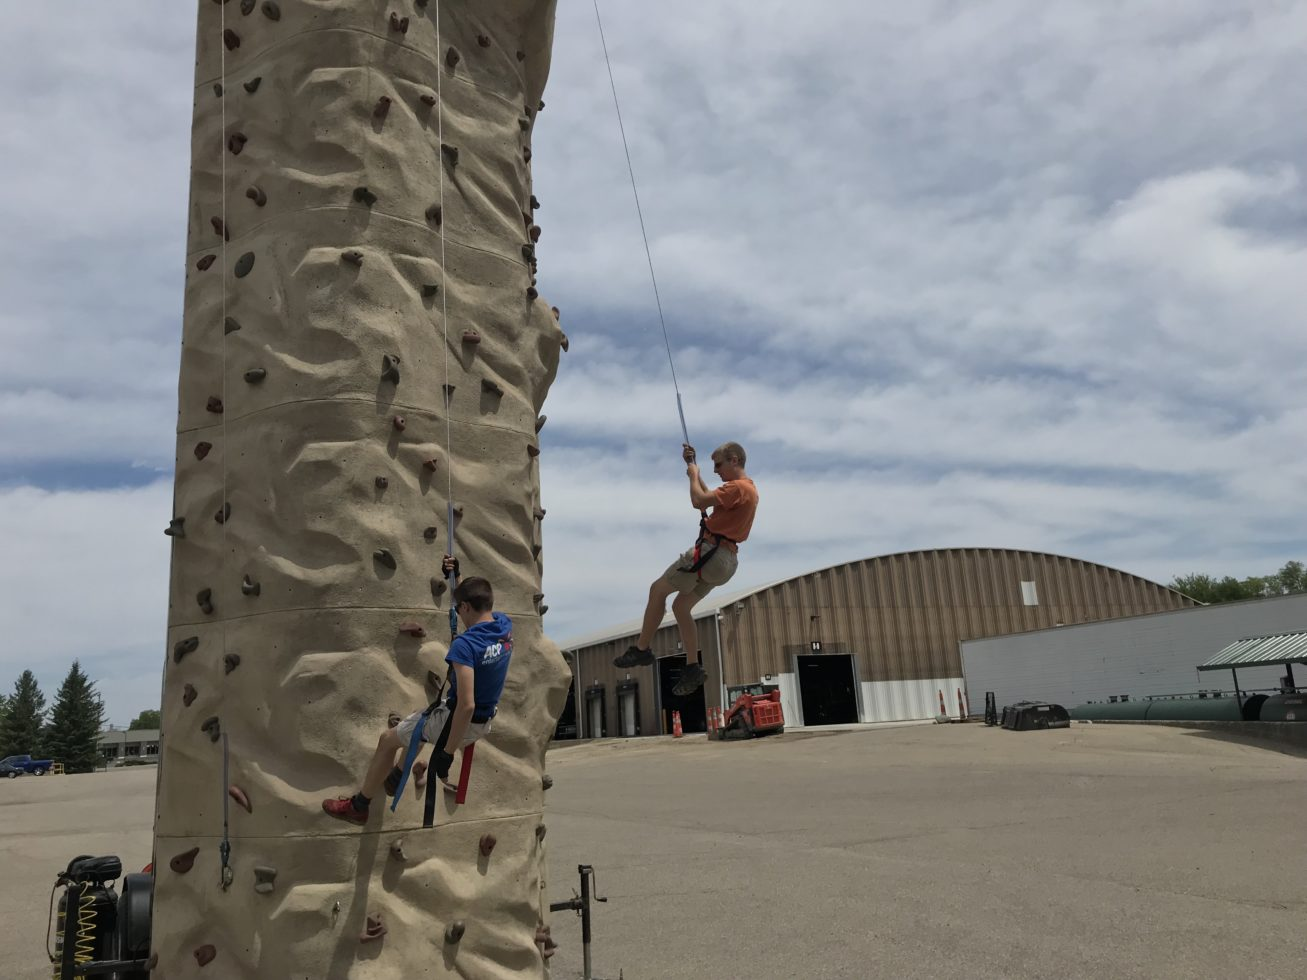 Repelling off the Sahara Climbing Wall Rental